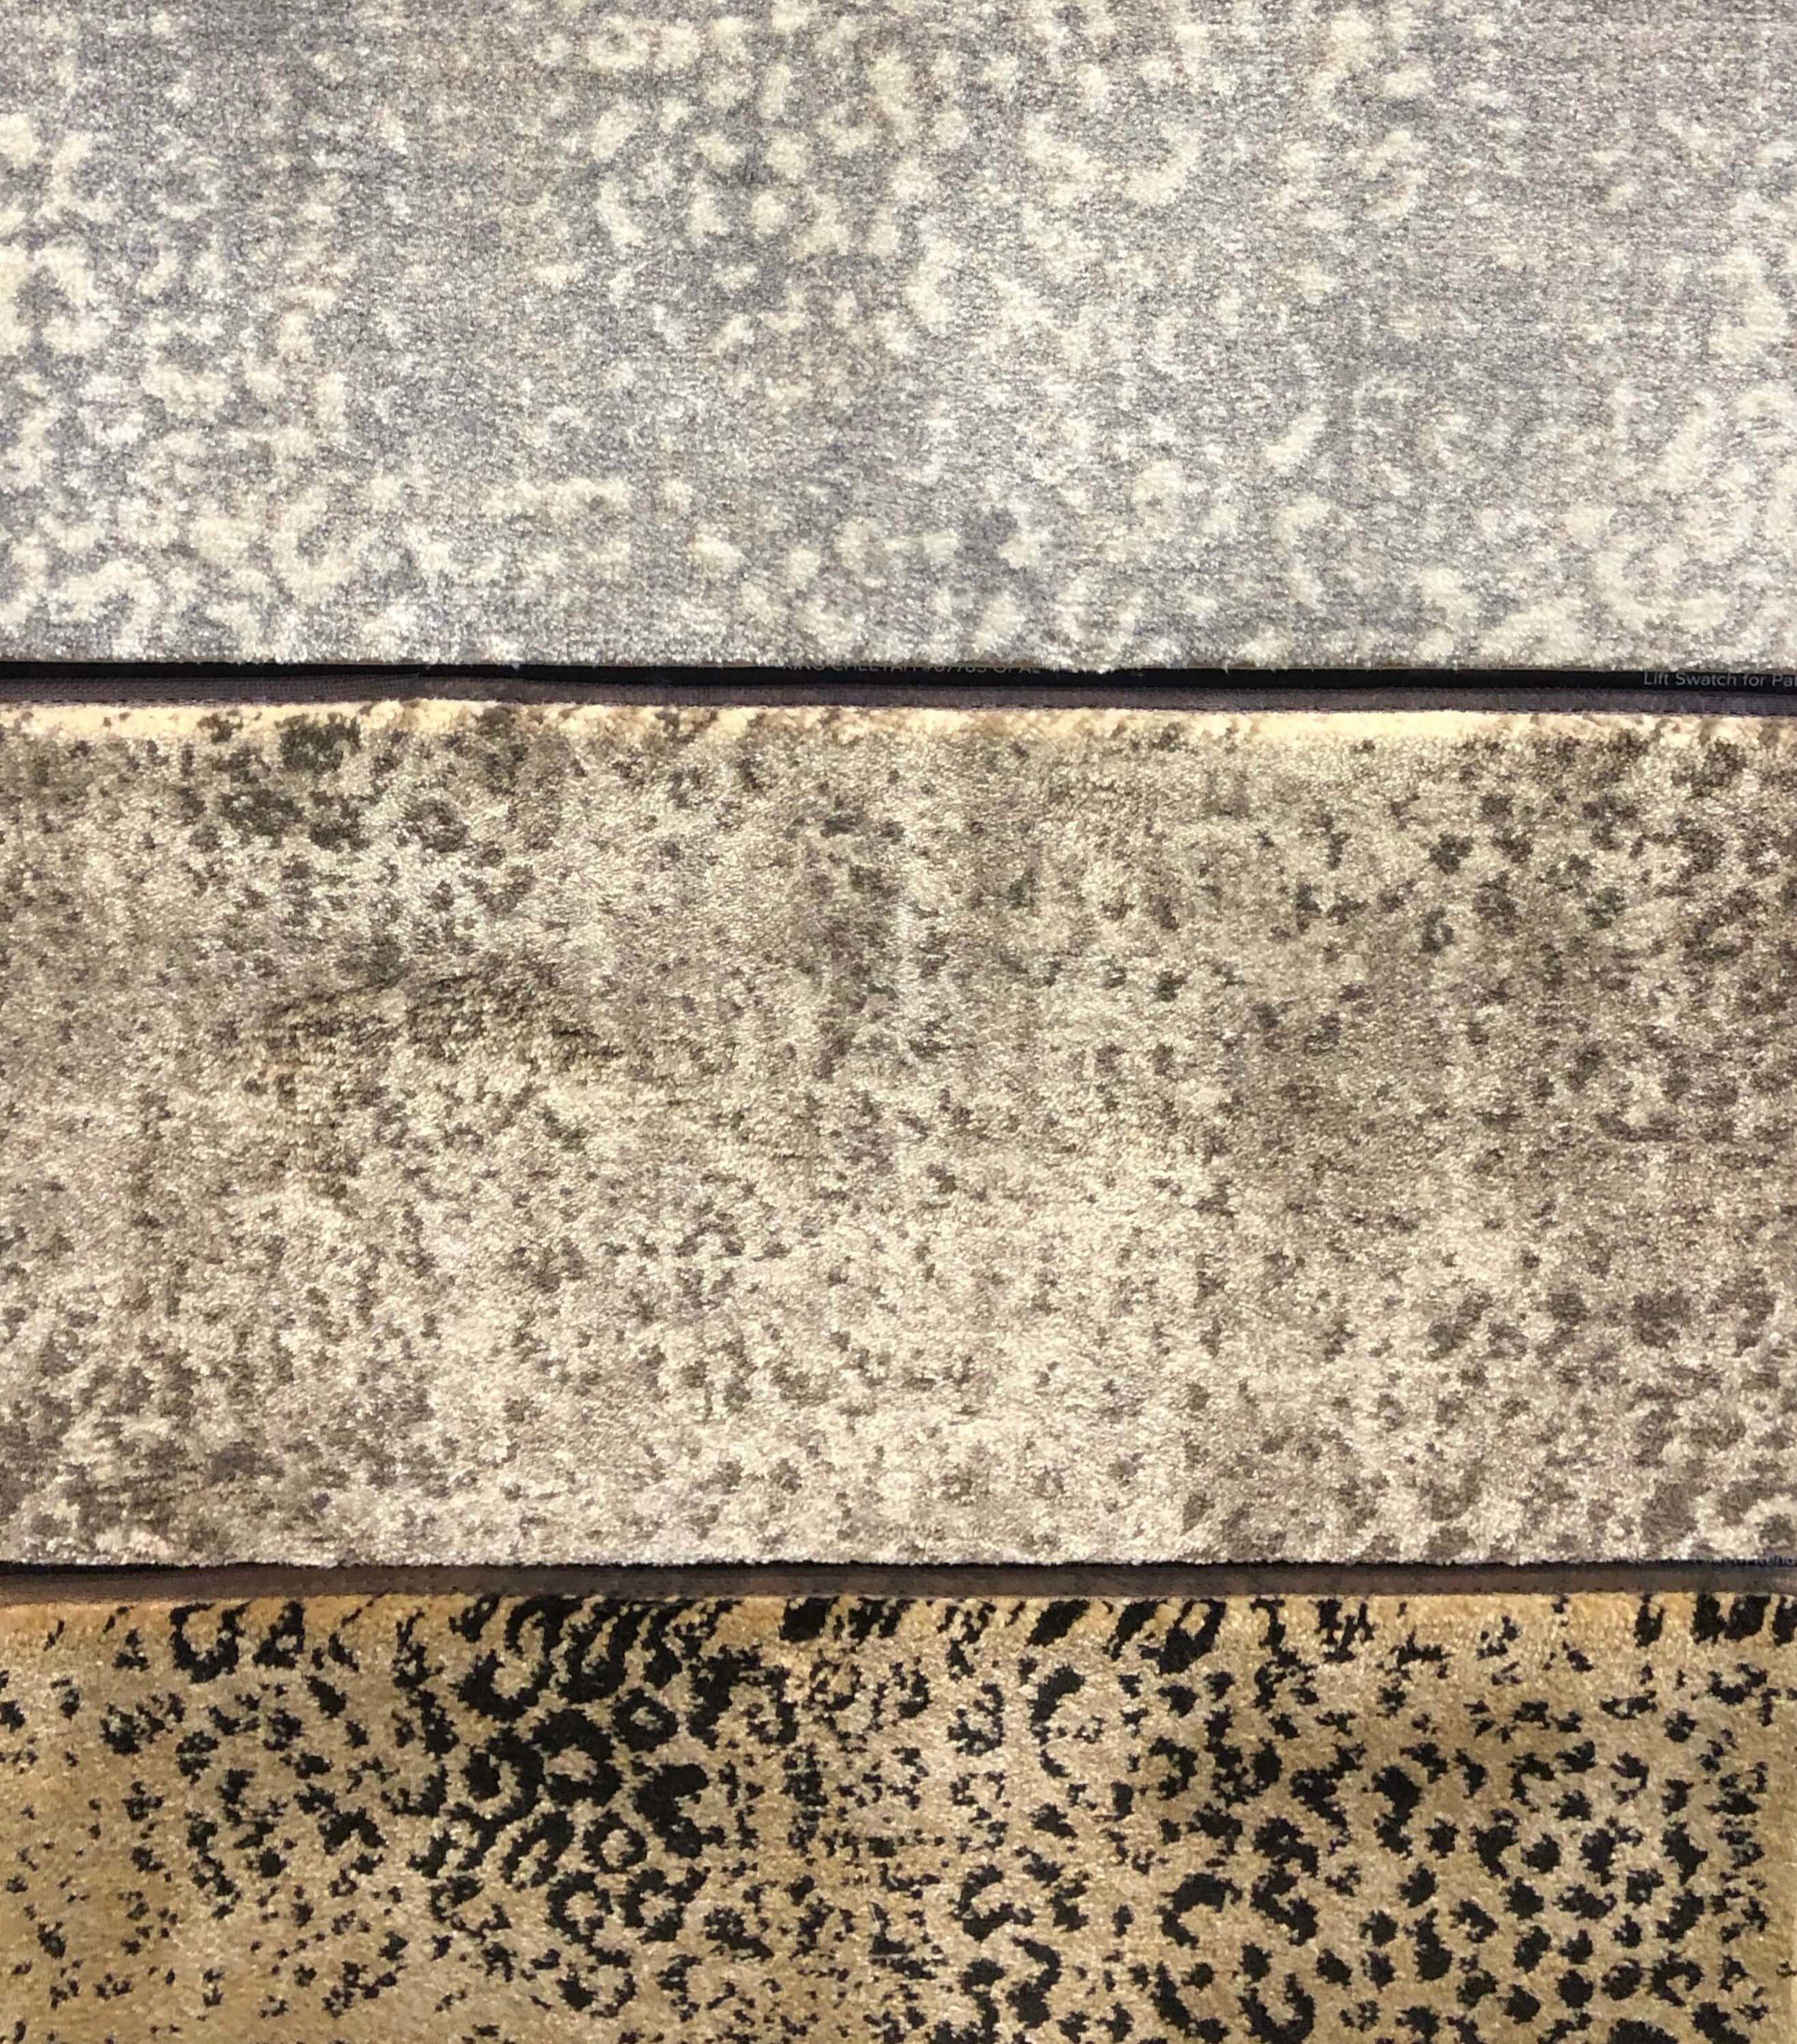 Wouldn't this animal print carpet look great in a closet? #rugideas #animalprintcarpet